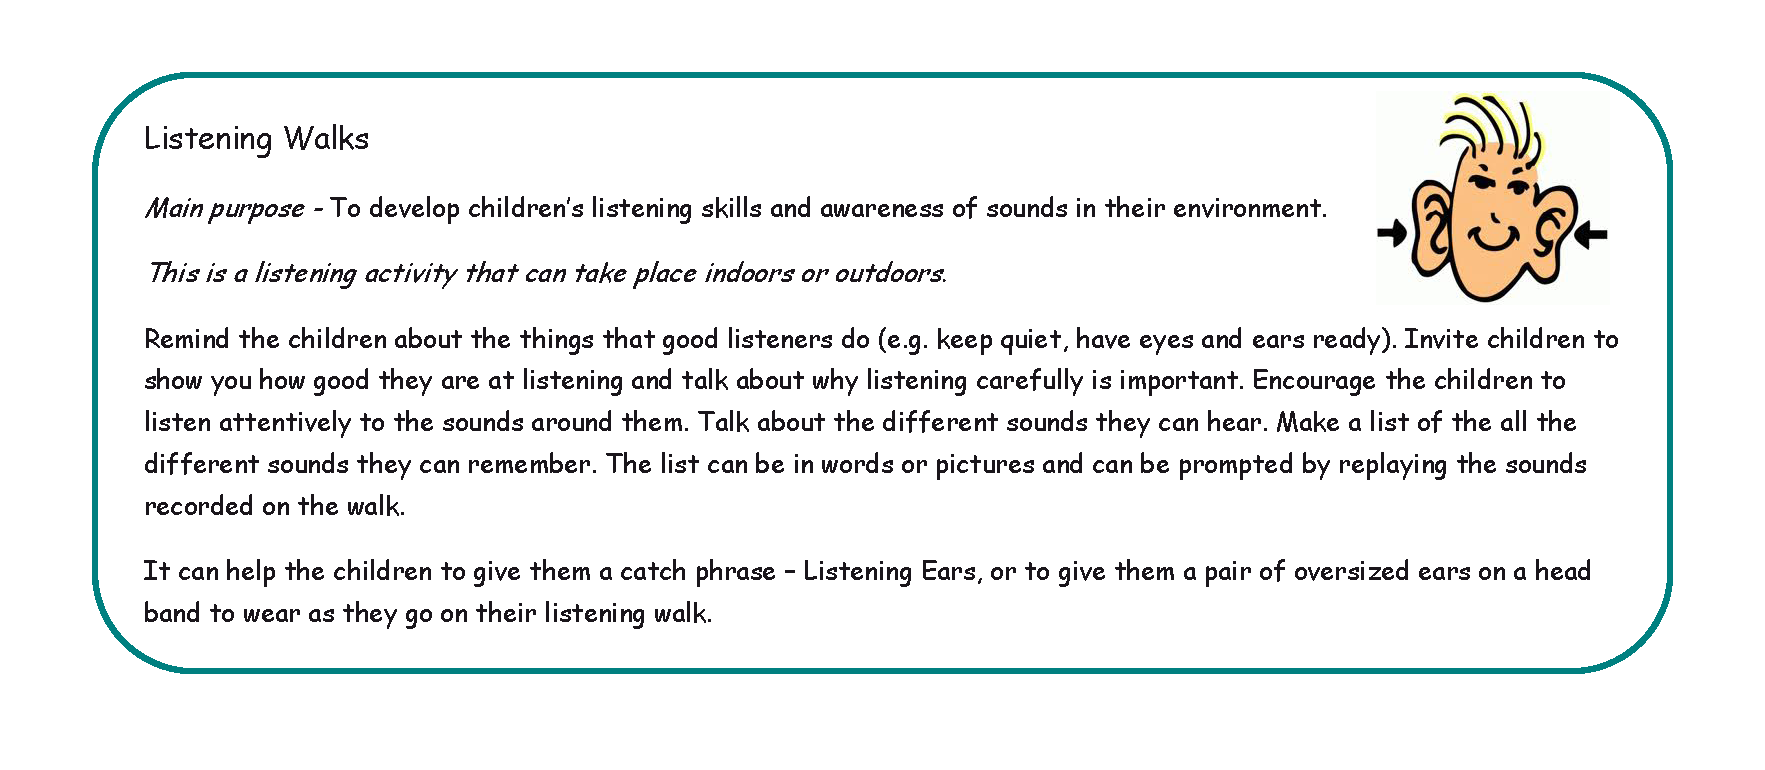 A Listening Walk